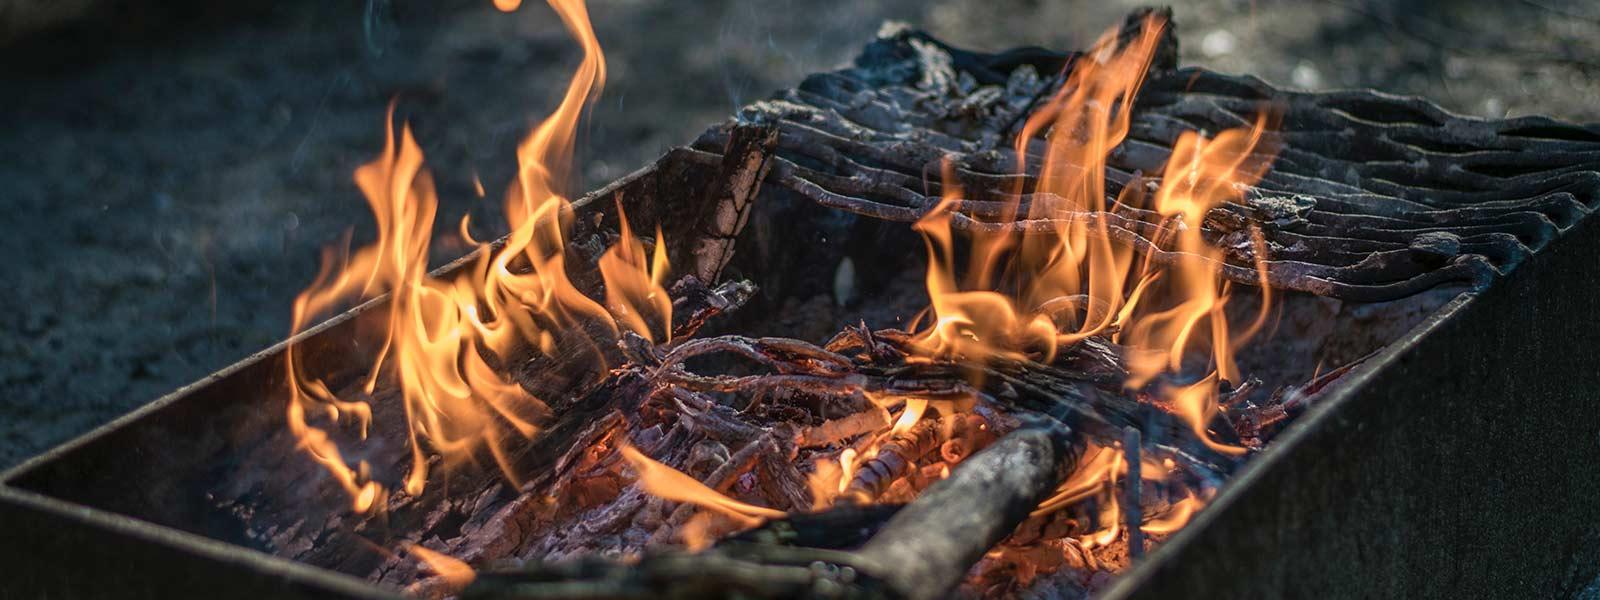 Beech /Oak / White Ash Firewood